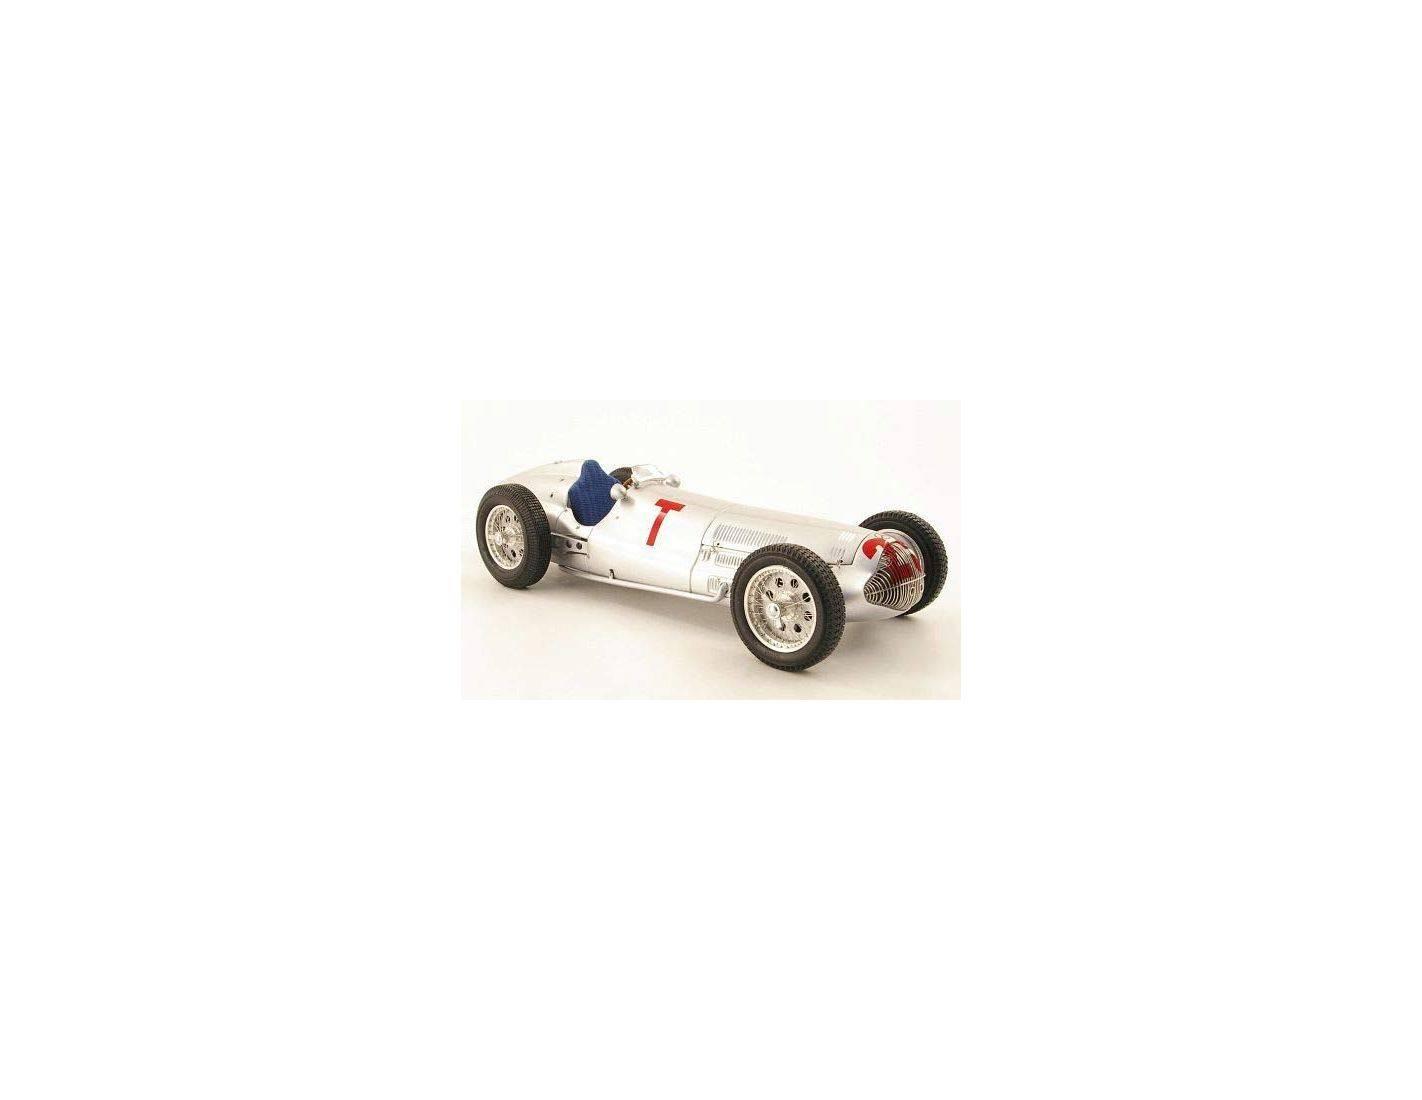 CMC M099 MERCEDES BENZ W154 T CAR DICK SEAMAN 1938 1:18 Modellino